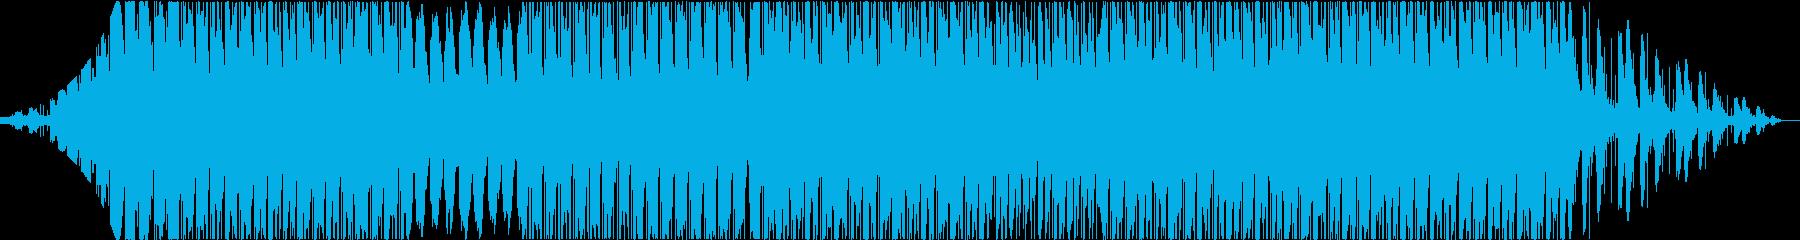 Lofi・花・リラックス・VLOGに最適の再生済みの波形